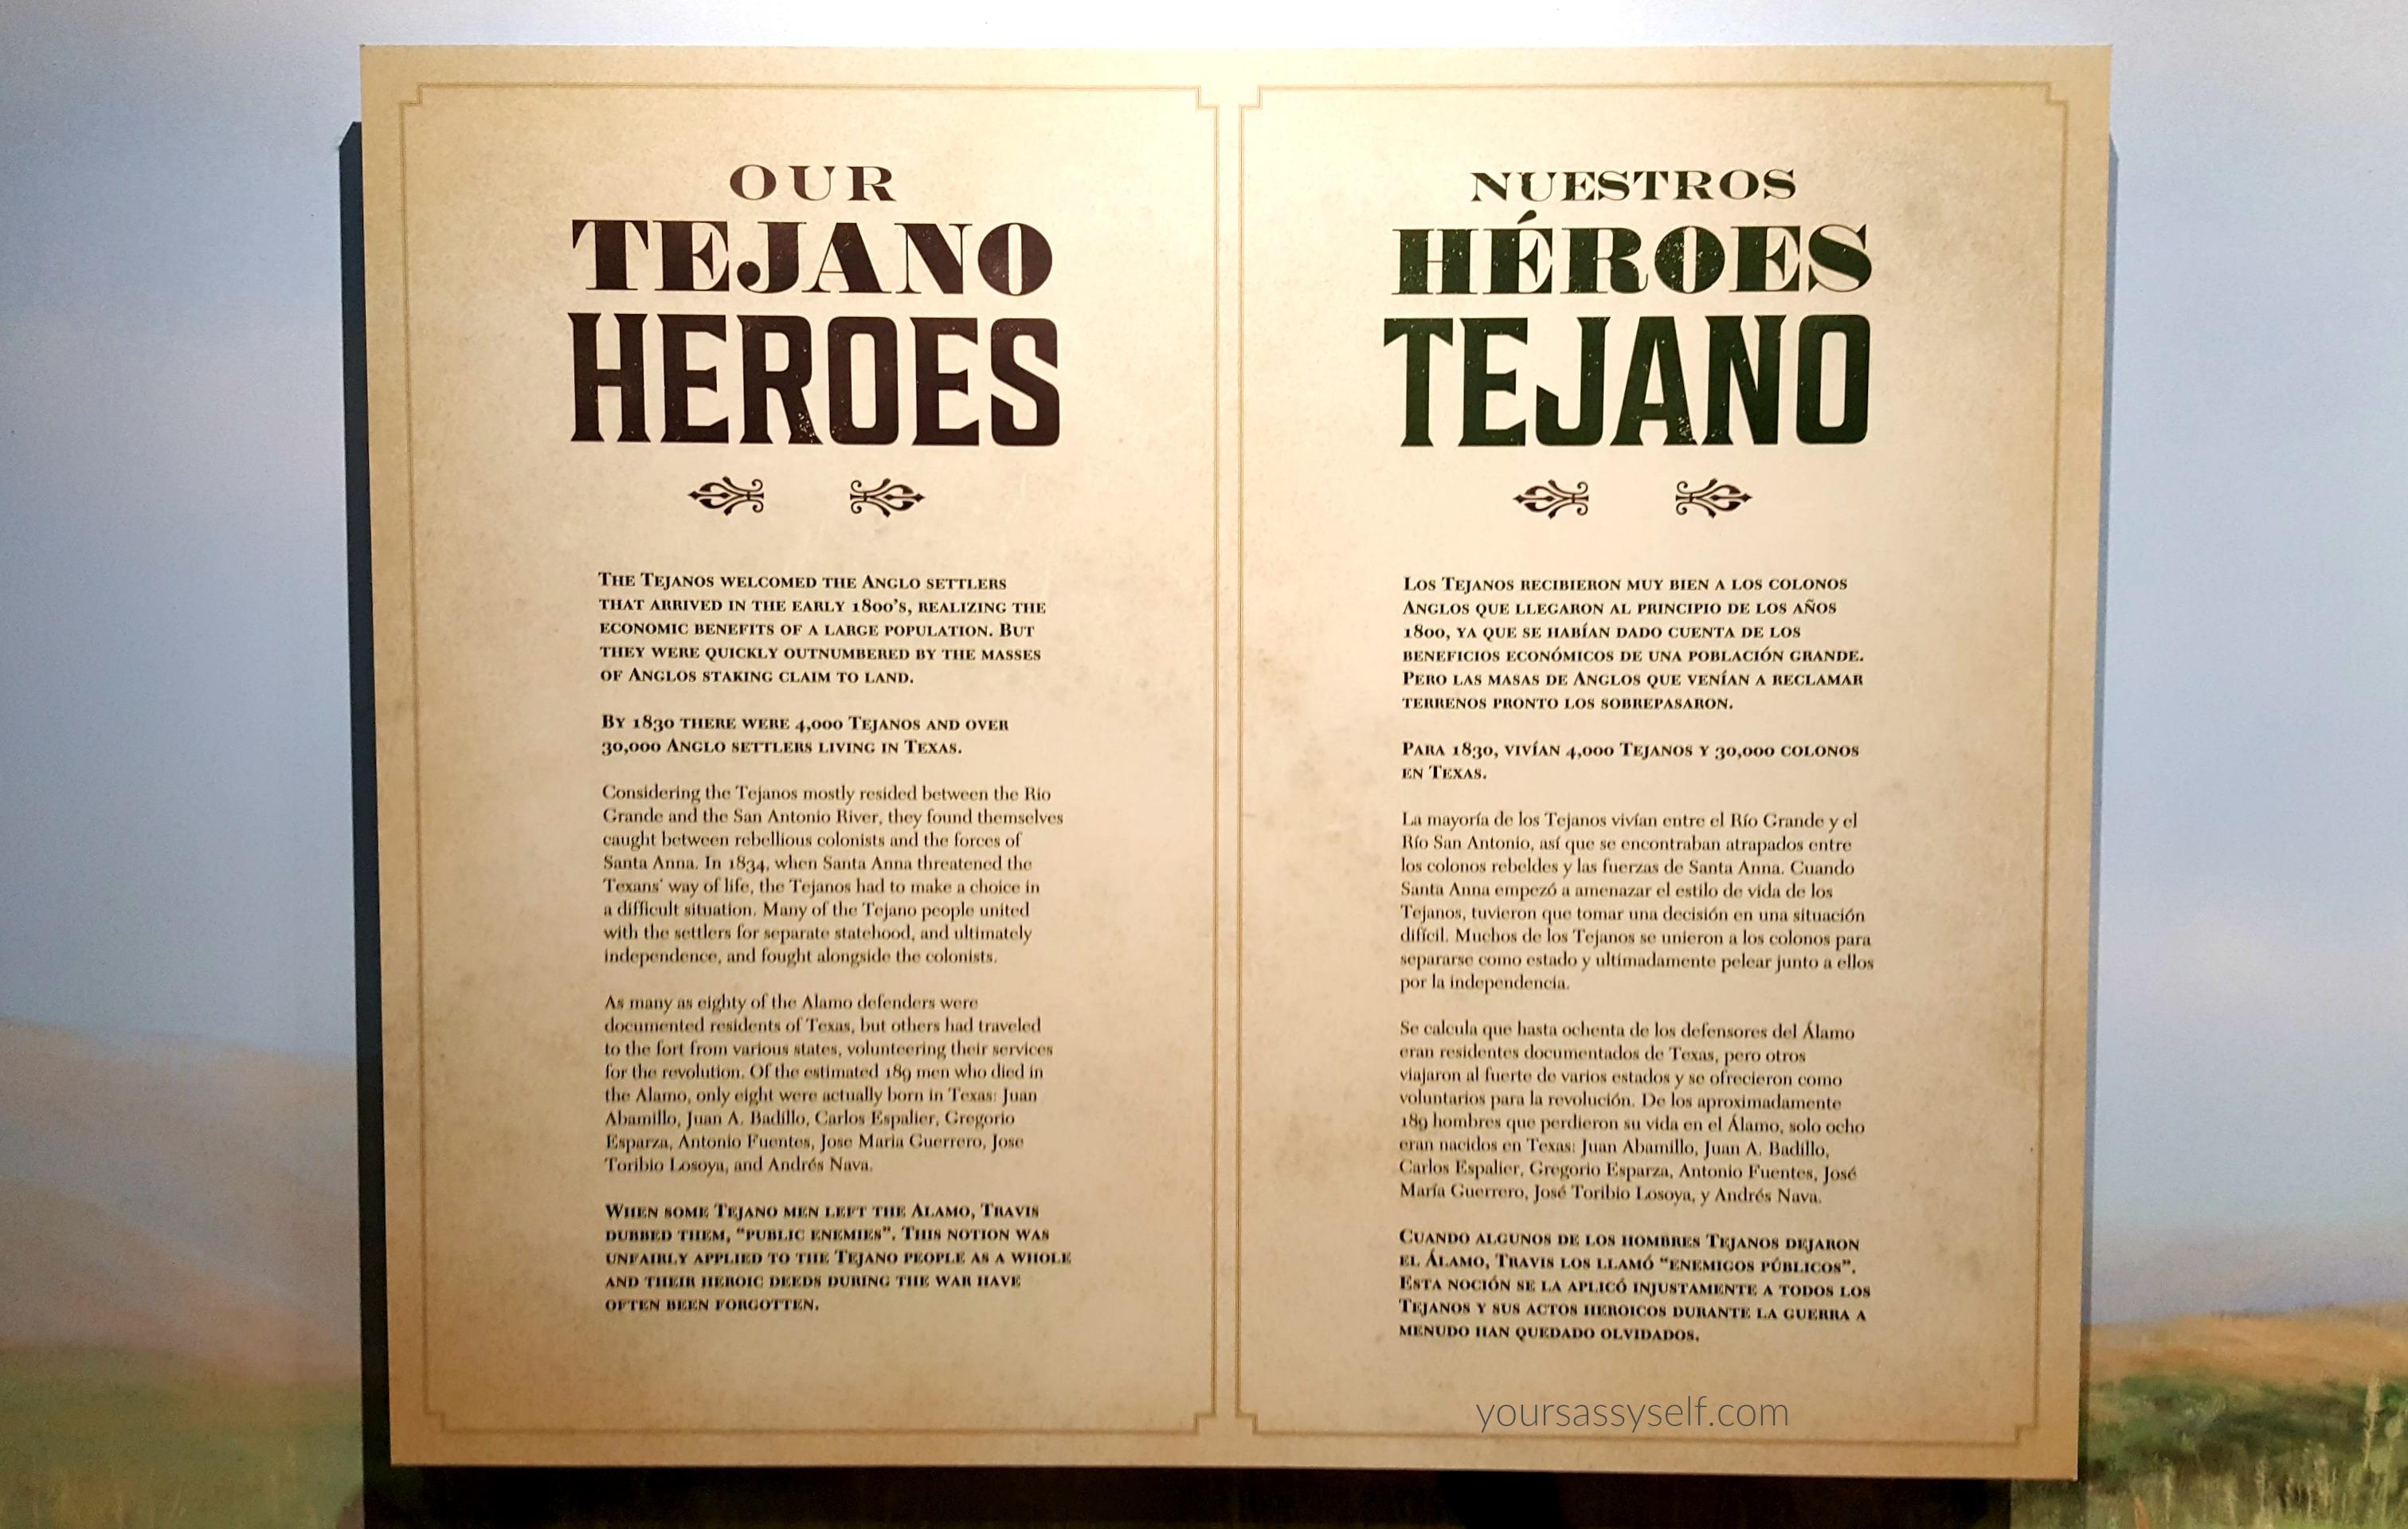 Bilingual Info Signage at Battle for Texas - yoursassyself.com